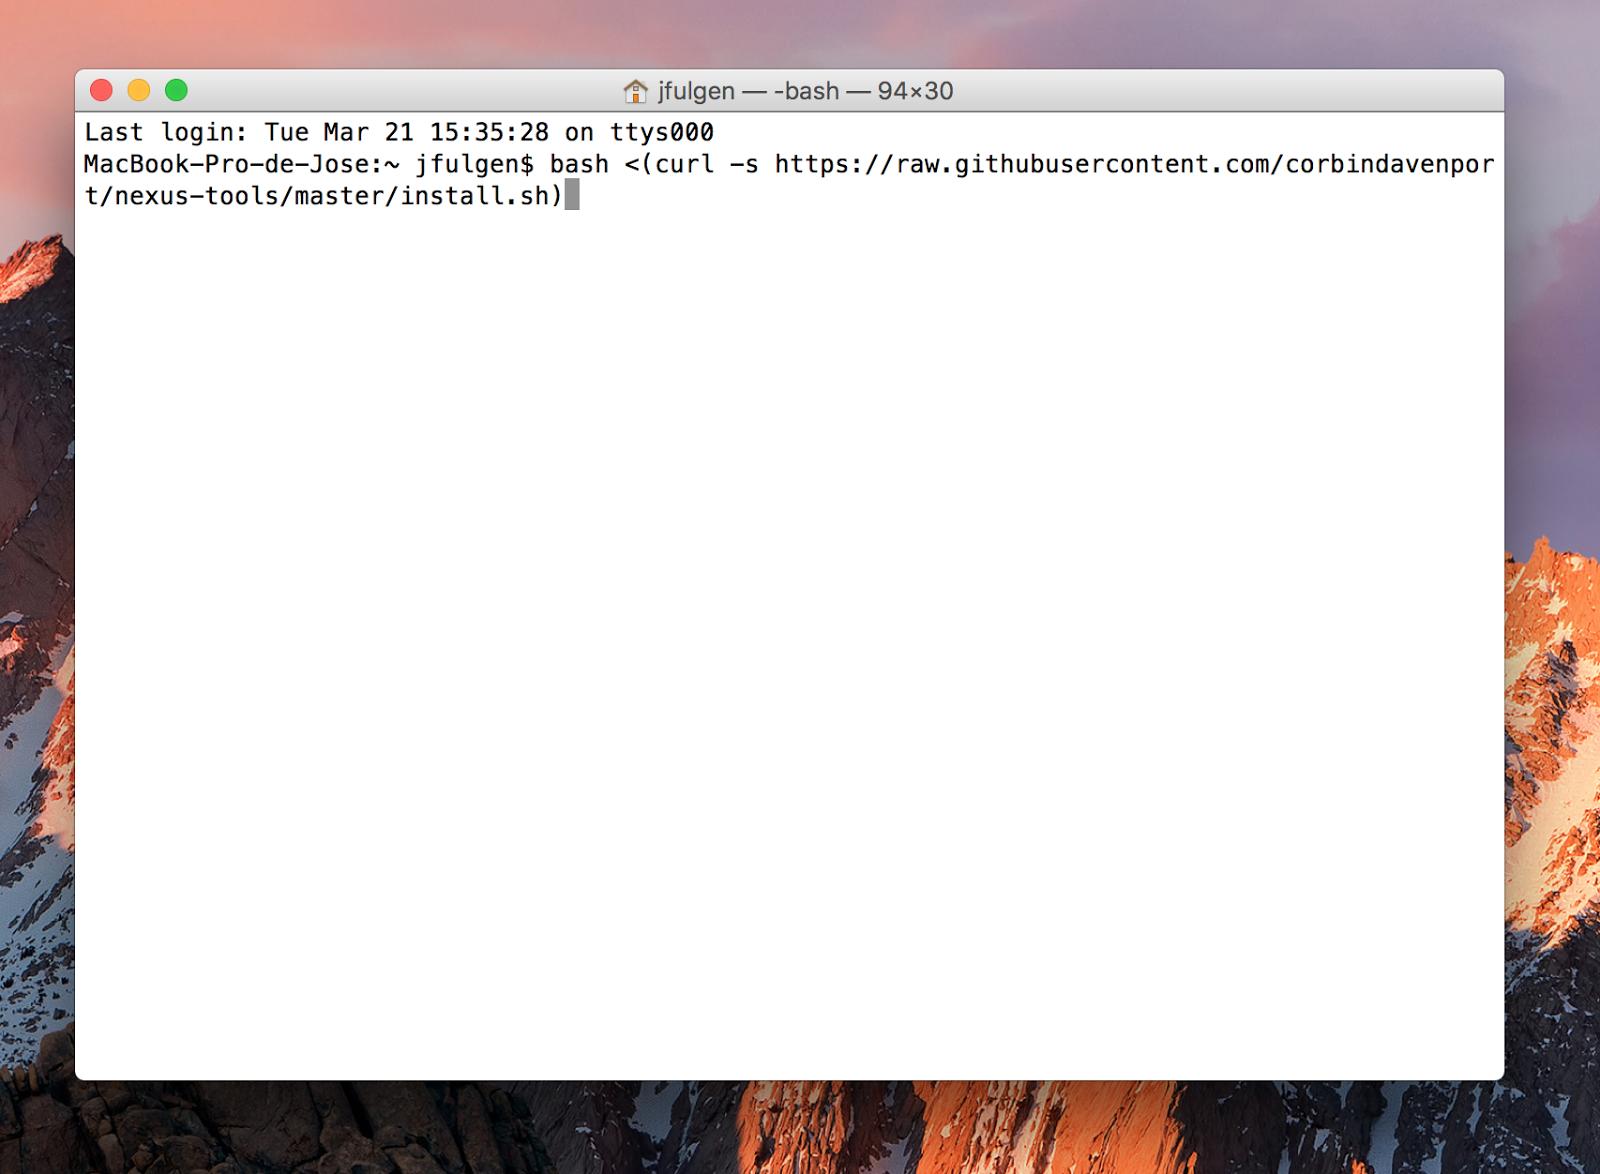 jfulgen blog: Instalar drivers ADB y Fastboot en Mac OS